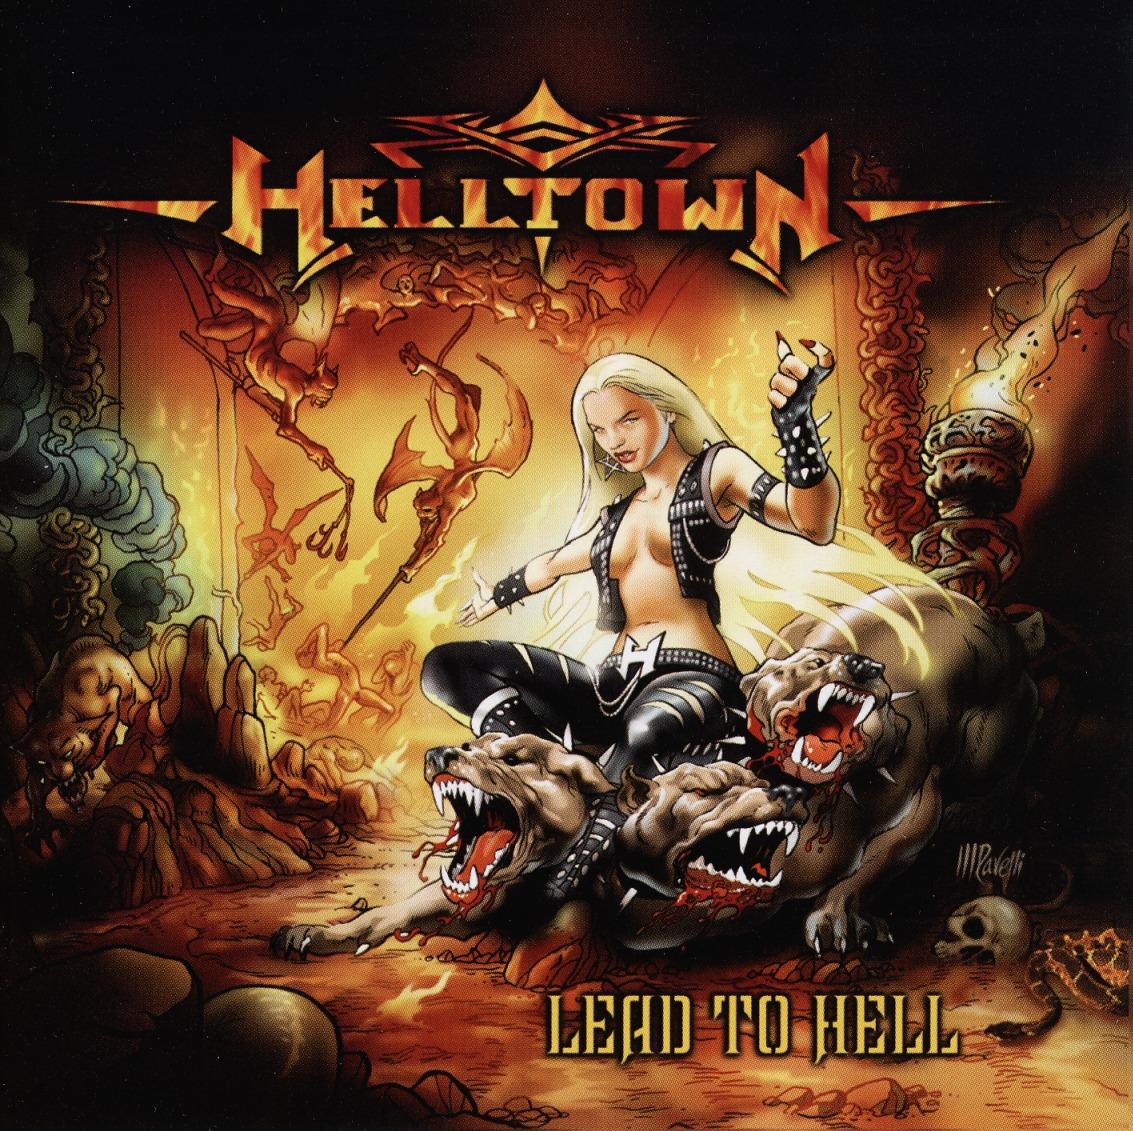 HELLTOWN (Brazil) / Lead To Hell